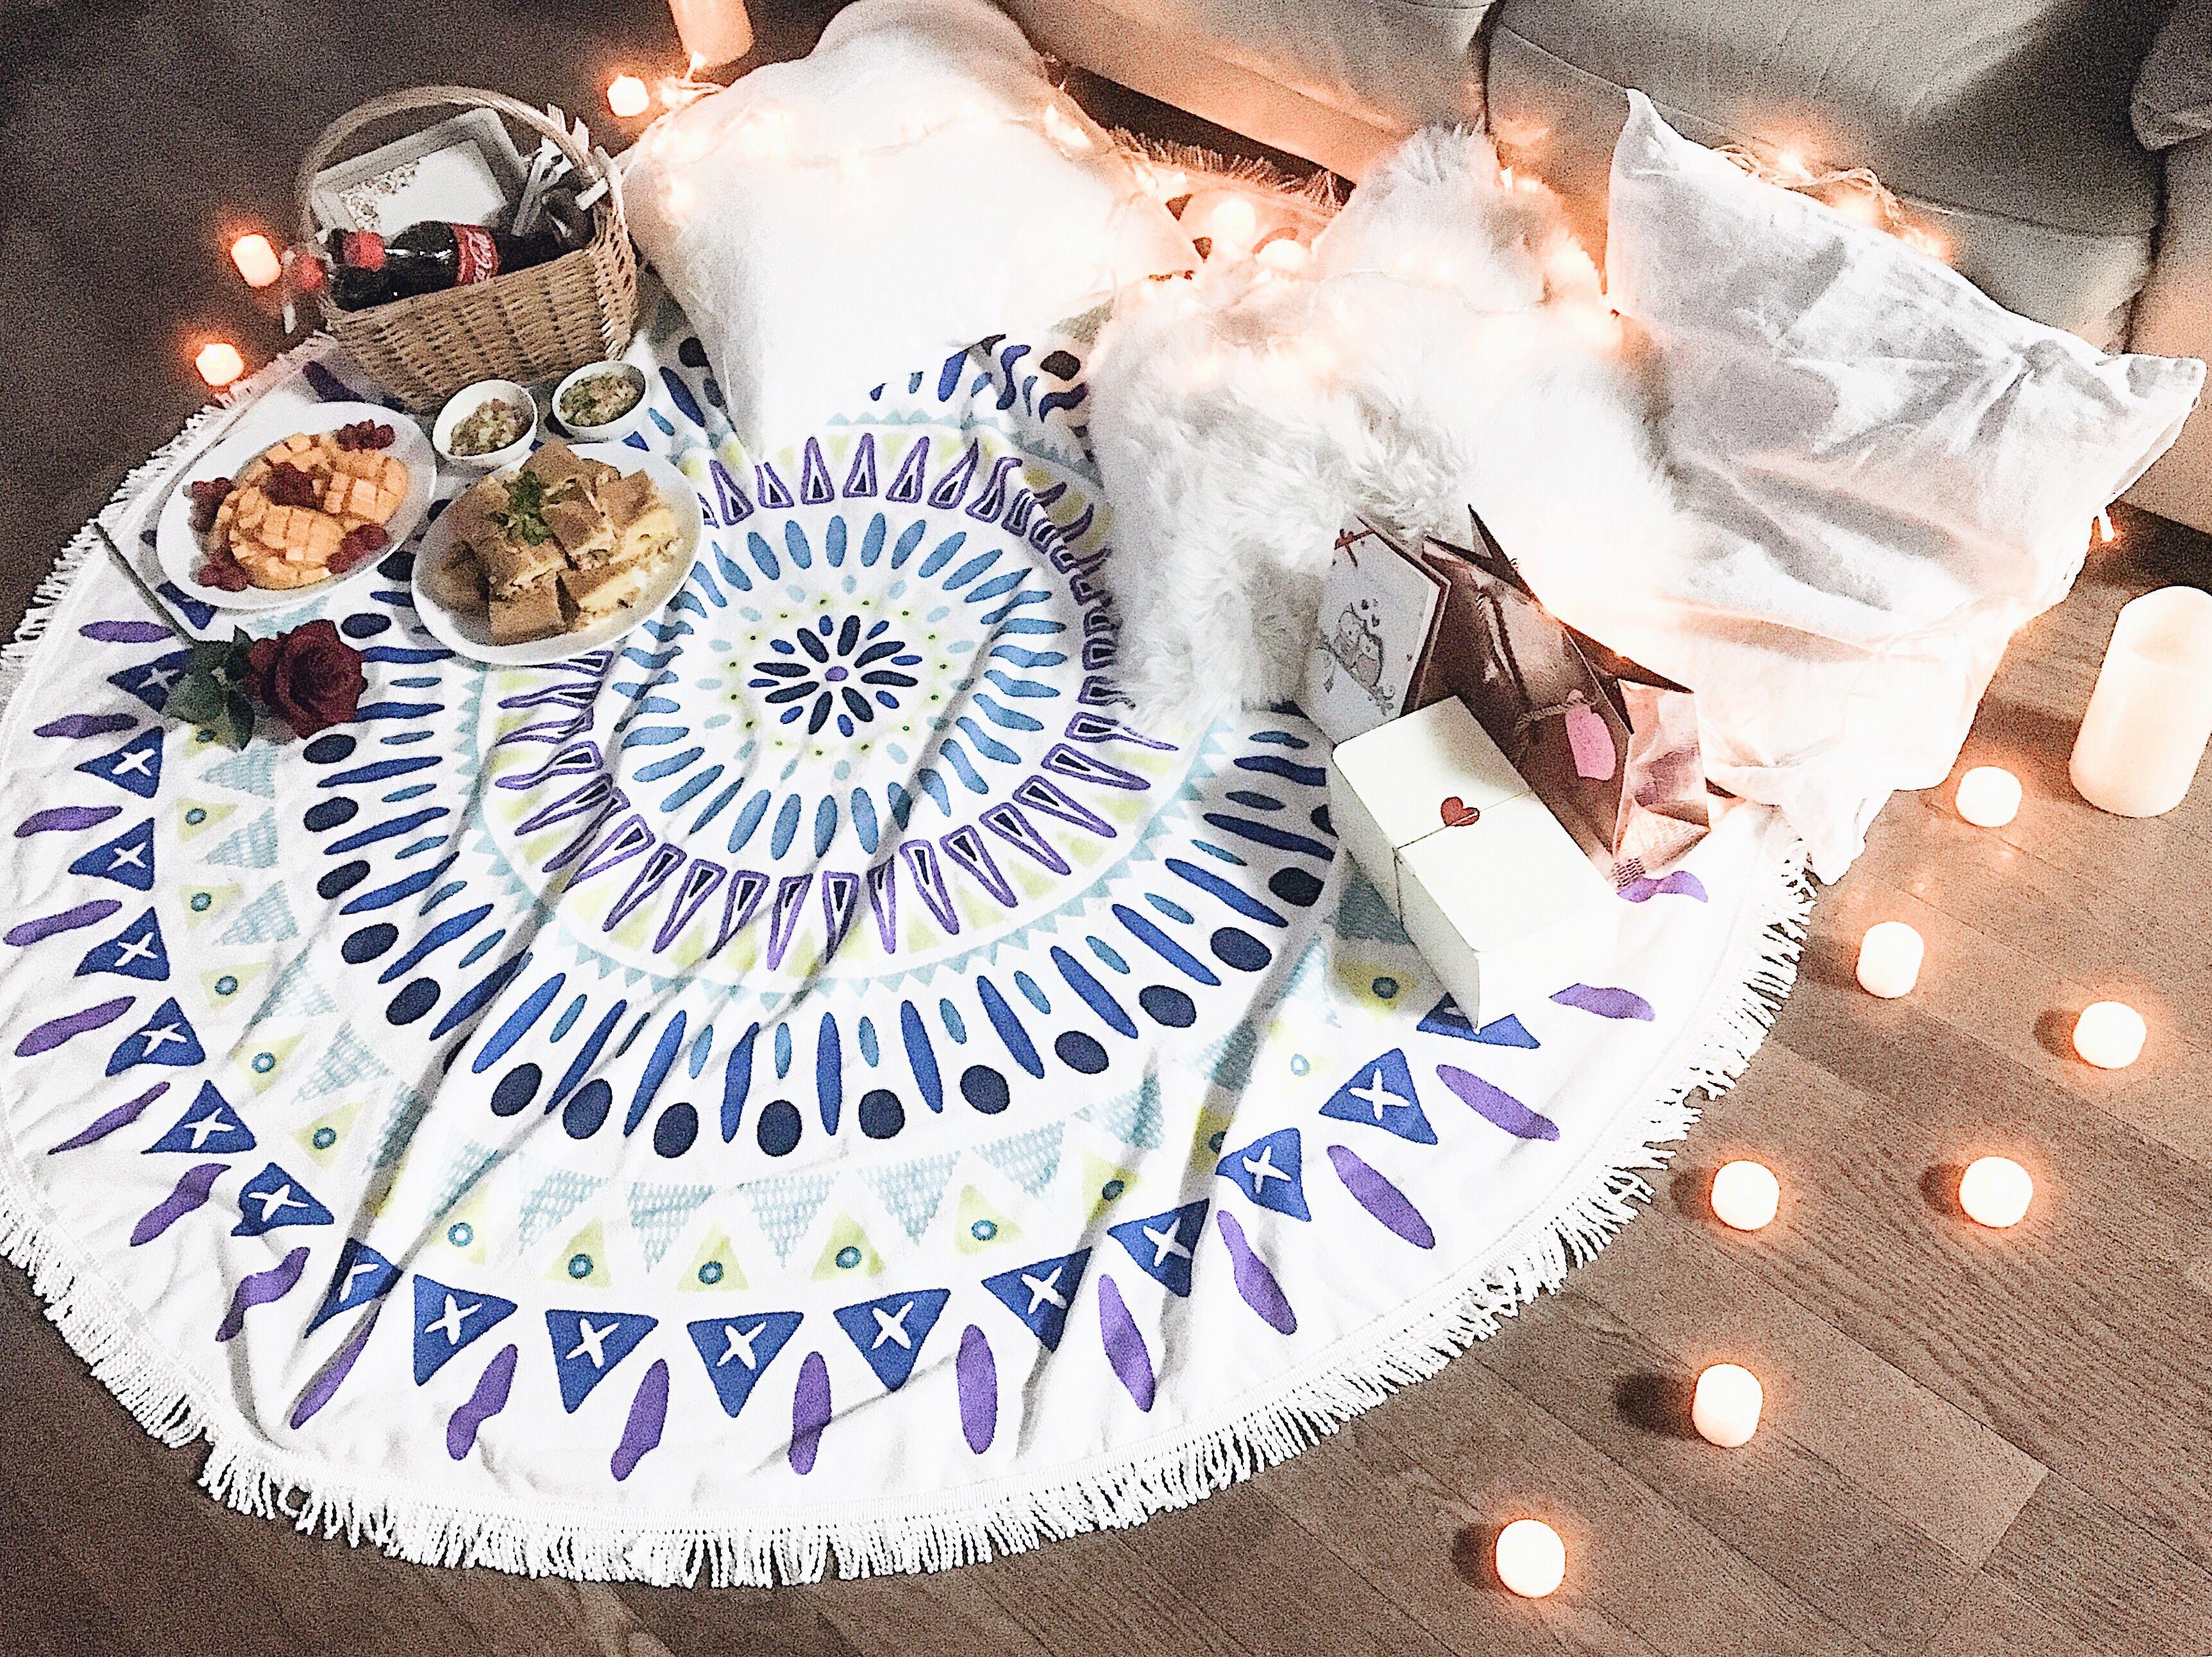 romantic picnic at home | Couple | Pinterest | Romantic picnics